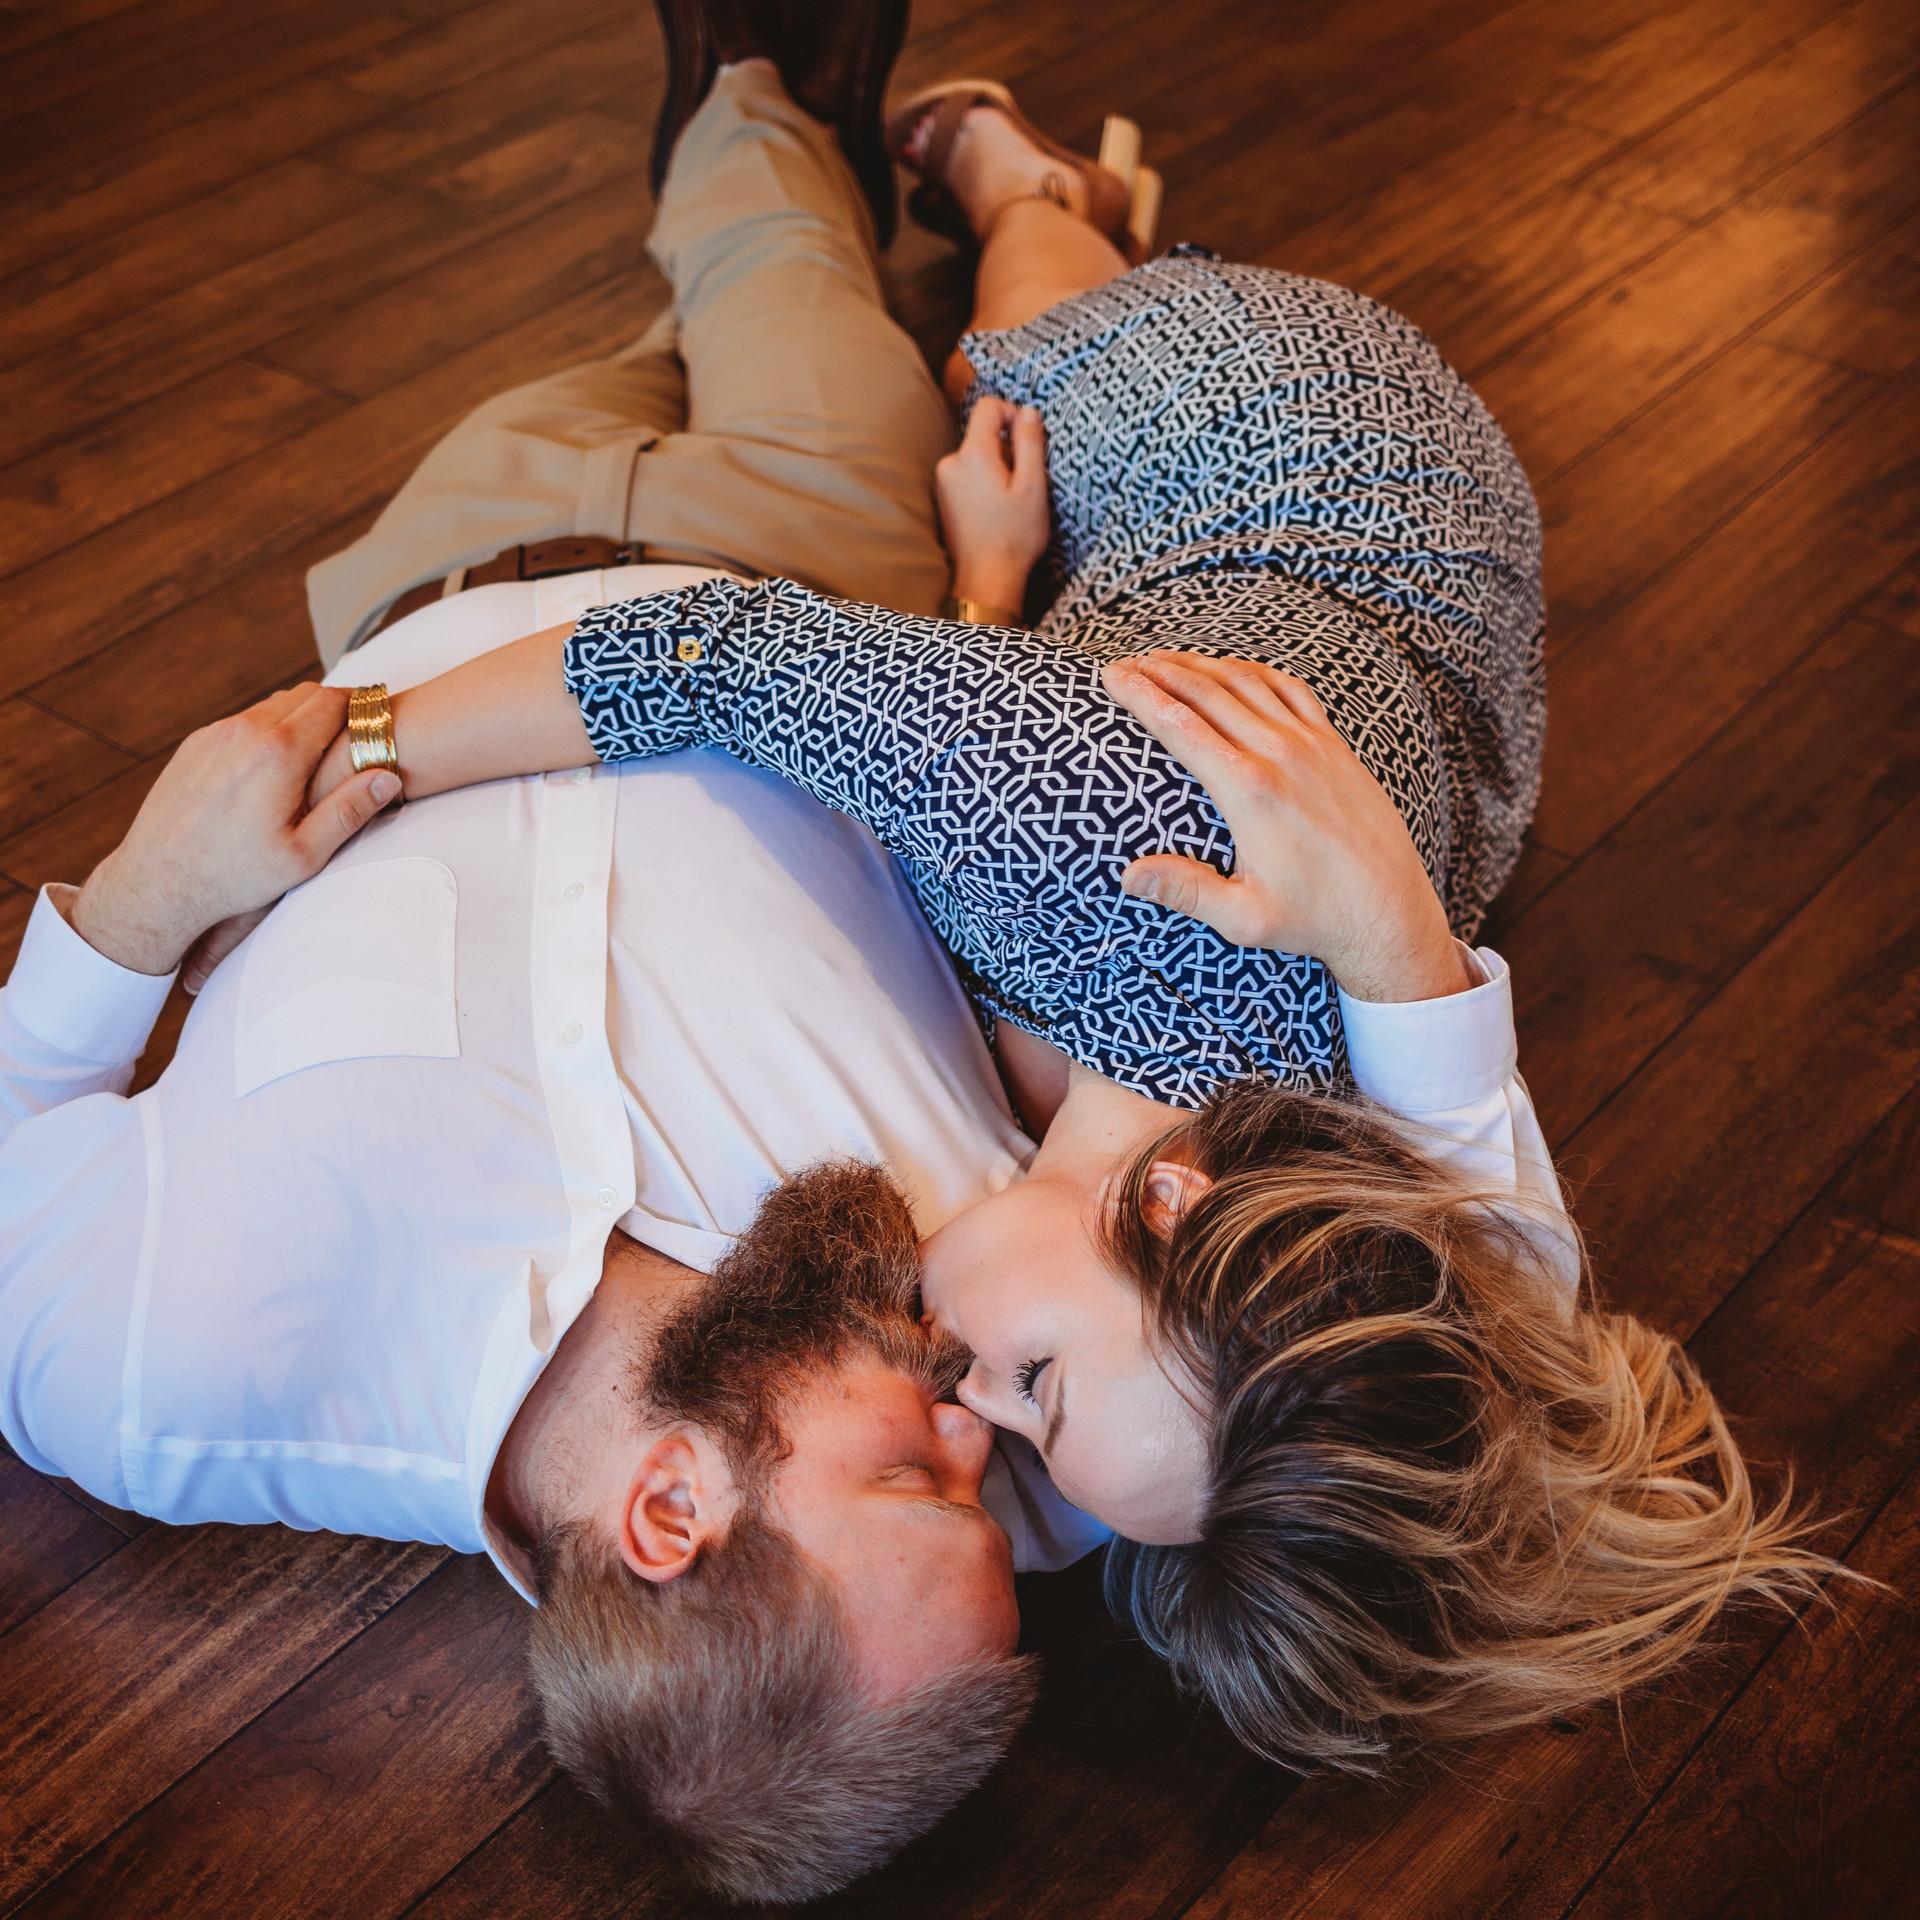 Couples Photo - Engagement Photographer - couples pictures - Lifestyle photographer